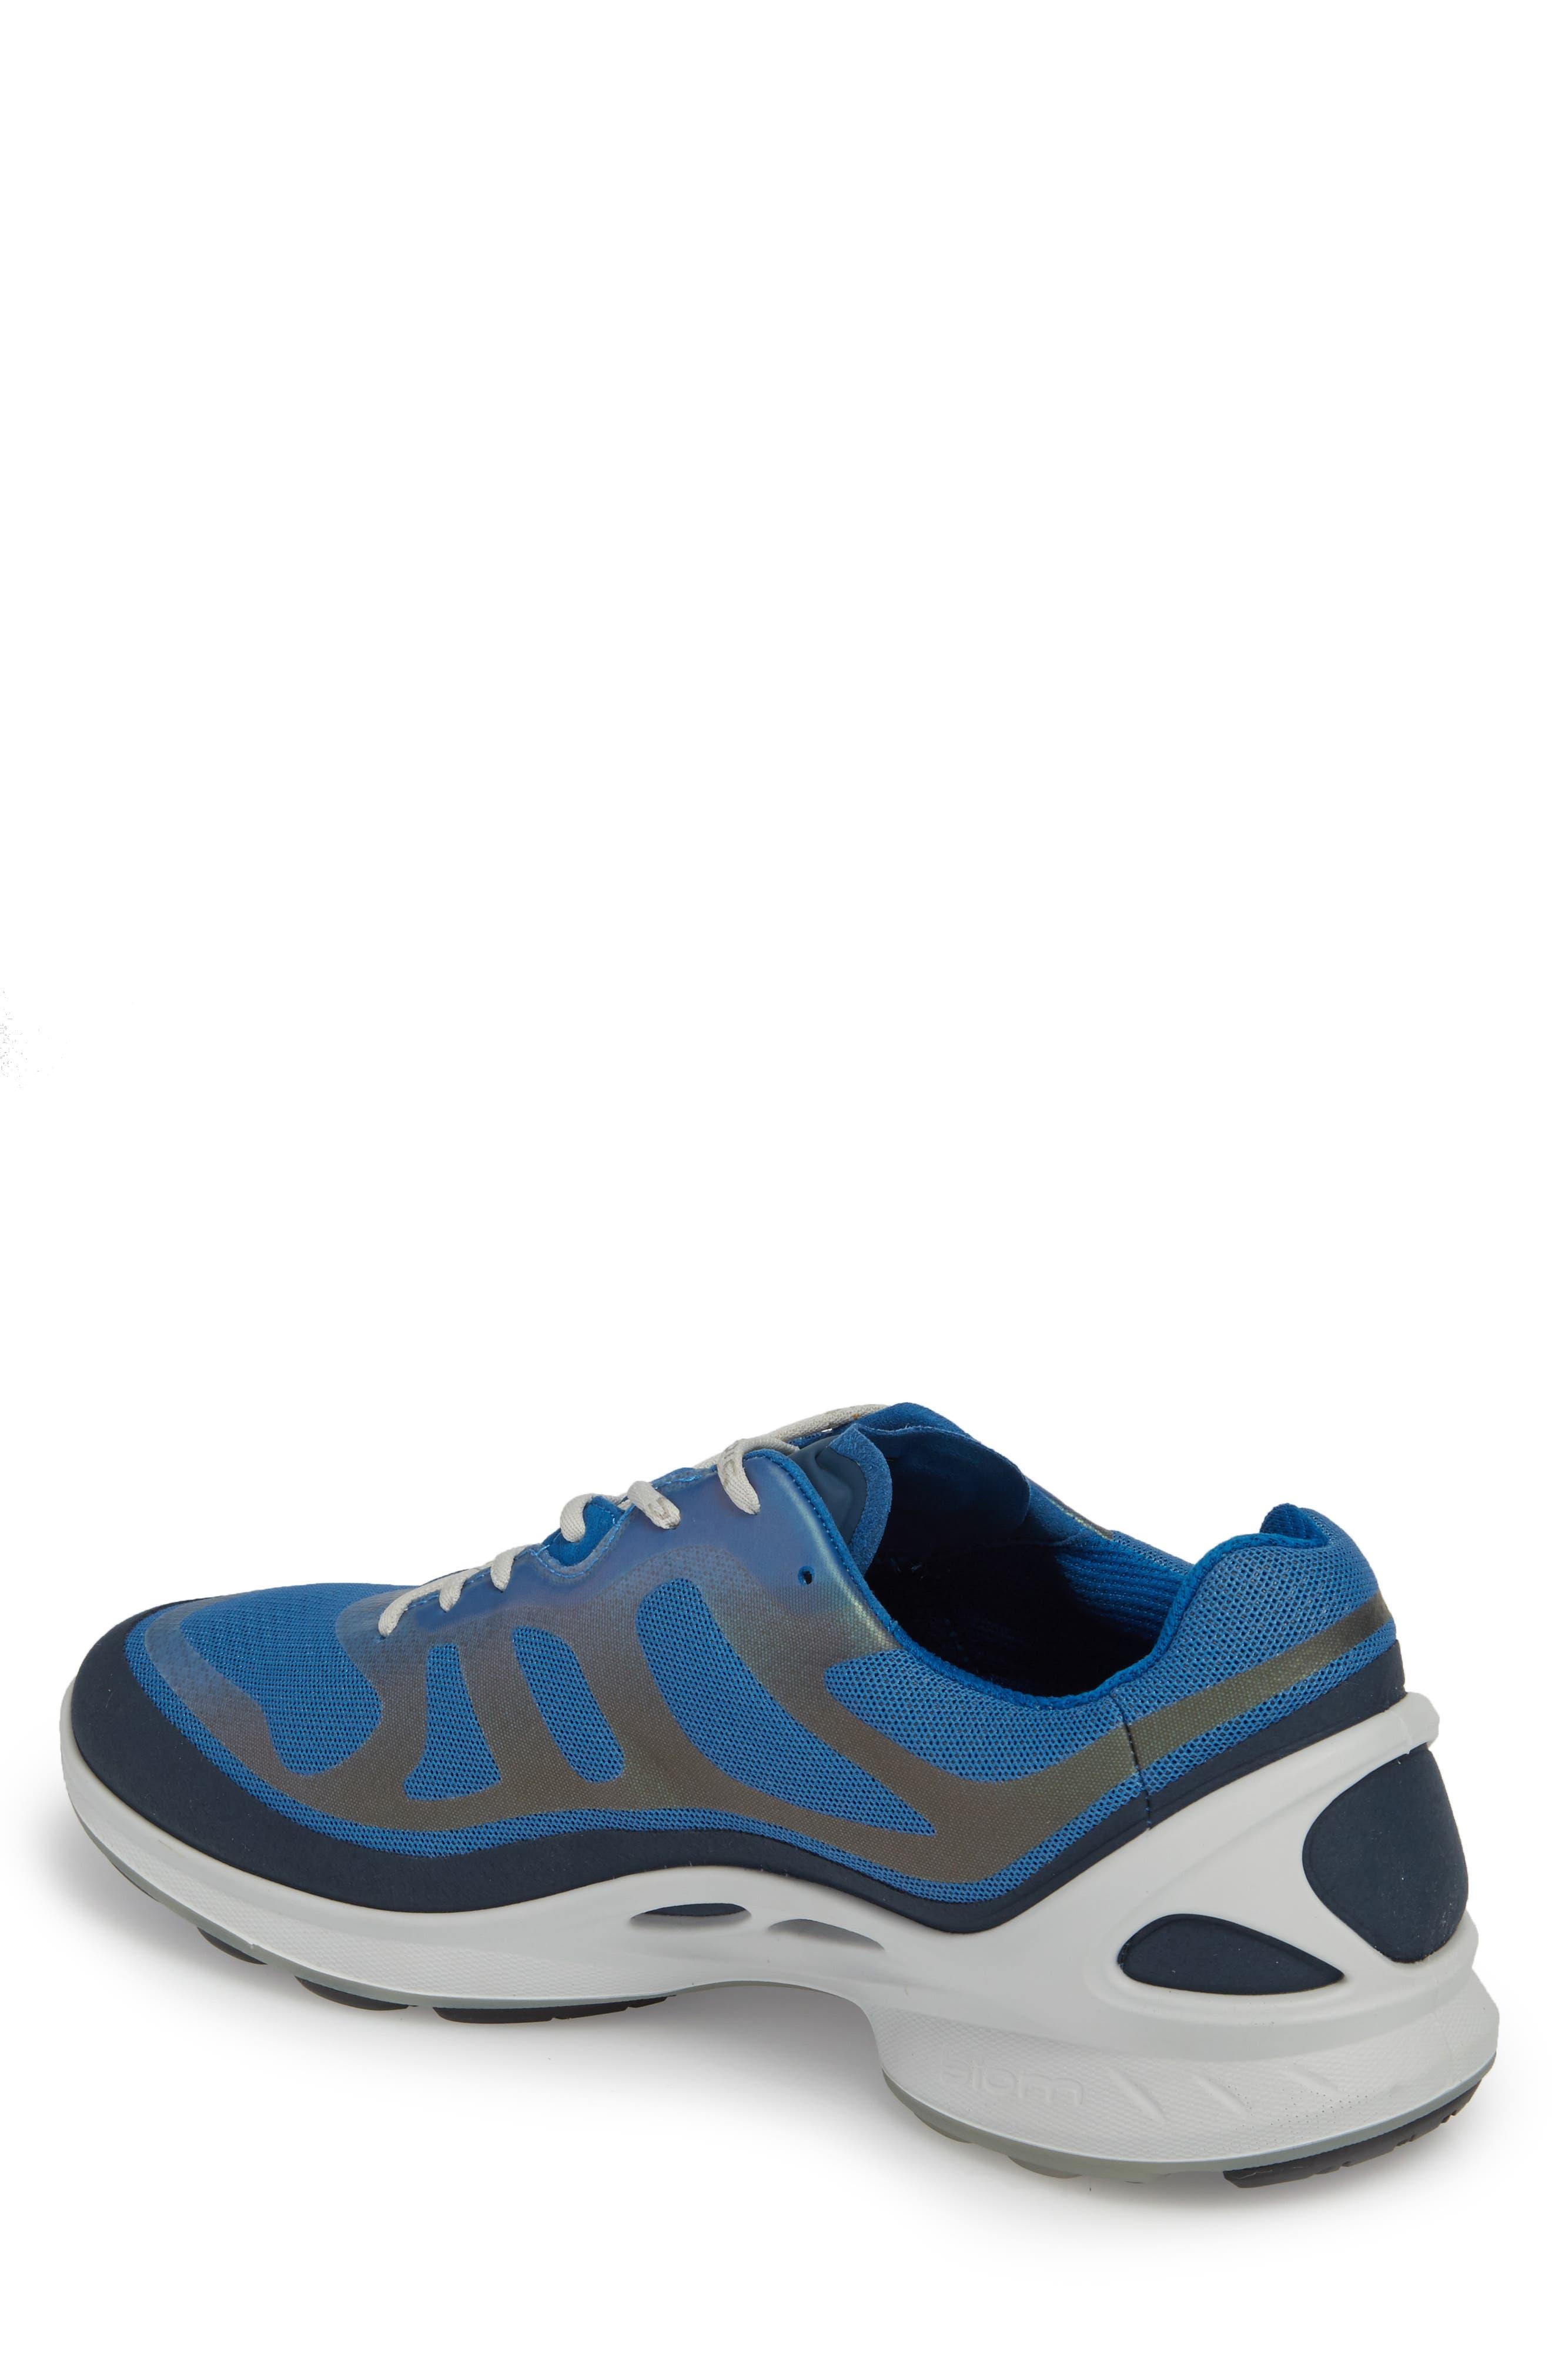 BIOM Fjuel Tie Sneaker,                             Alternate thumbnail 2, color,                             MARINE/ BLUE TEXTILE